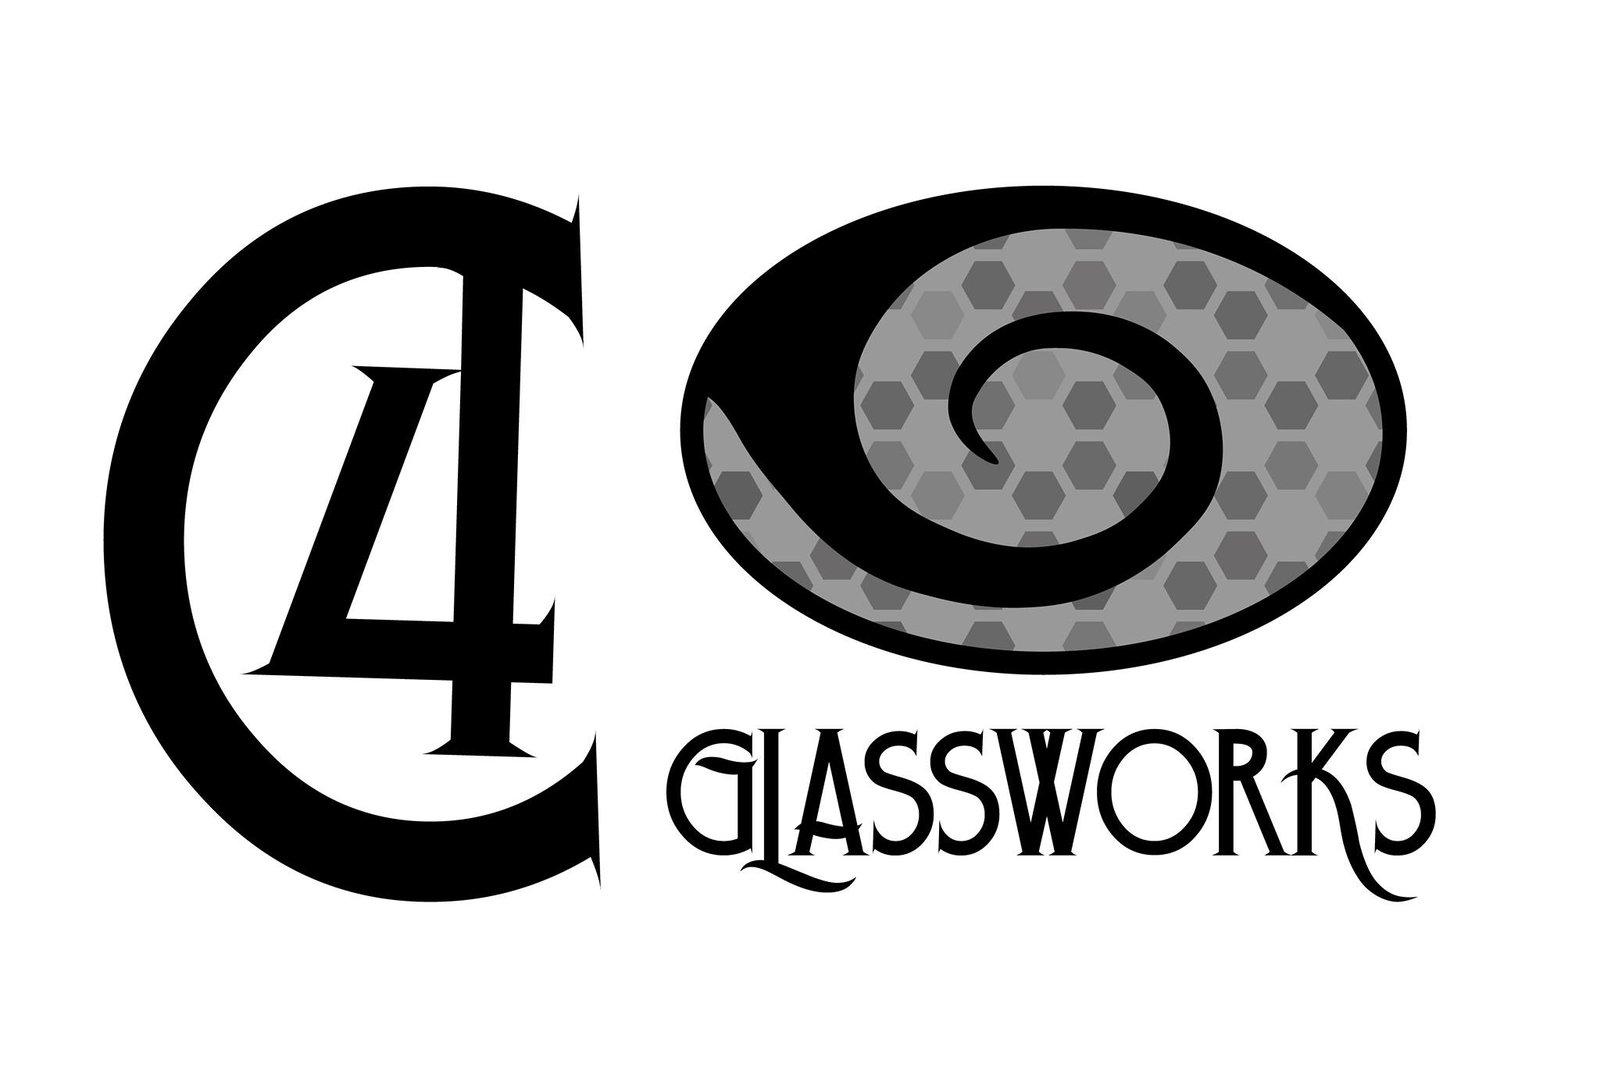 C-4 Glass